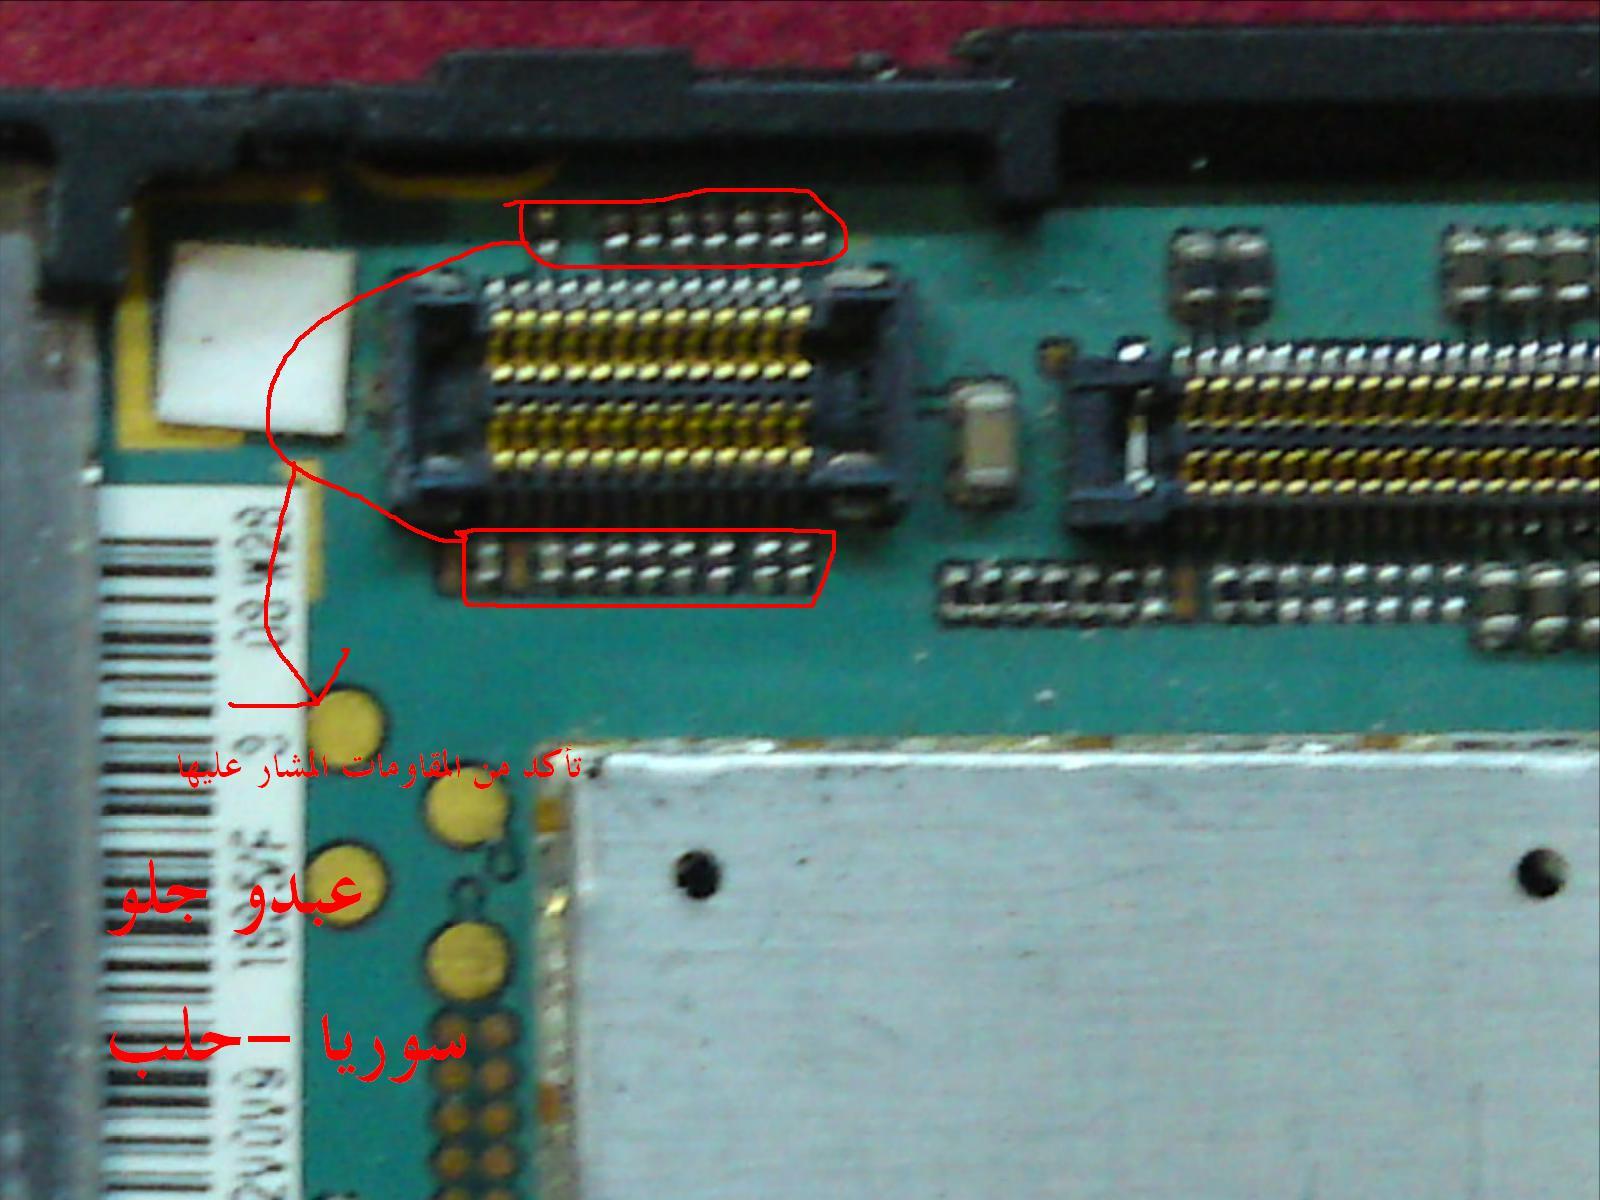 k850 الشاشة لا تعمل ولكن الجهاز شغال .... شو الحل